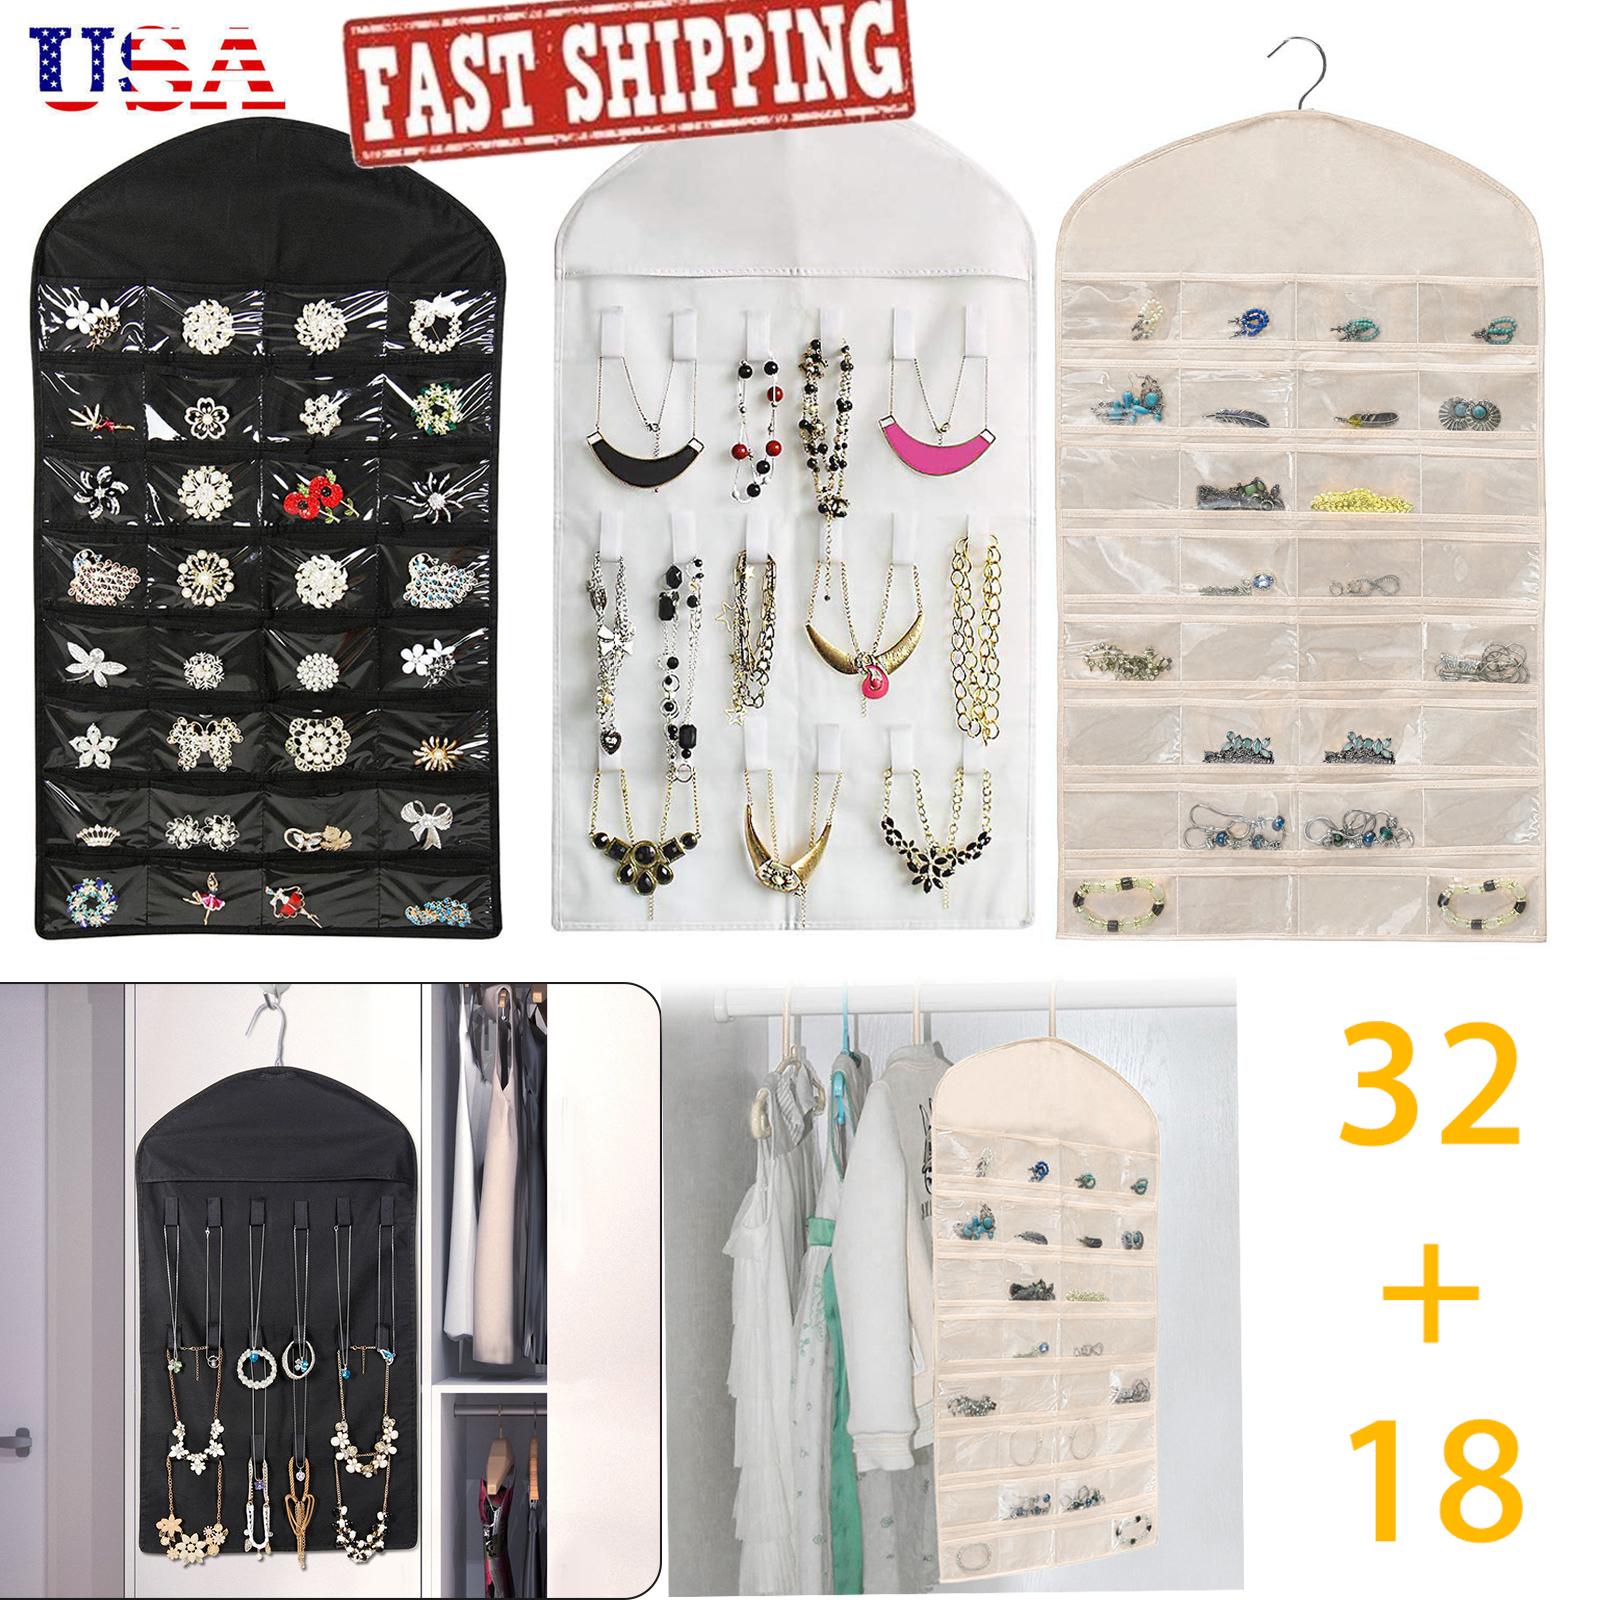 Image Is Loading Closet Hanging Jewelry Organizer Necklace Storage Holder Bag